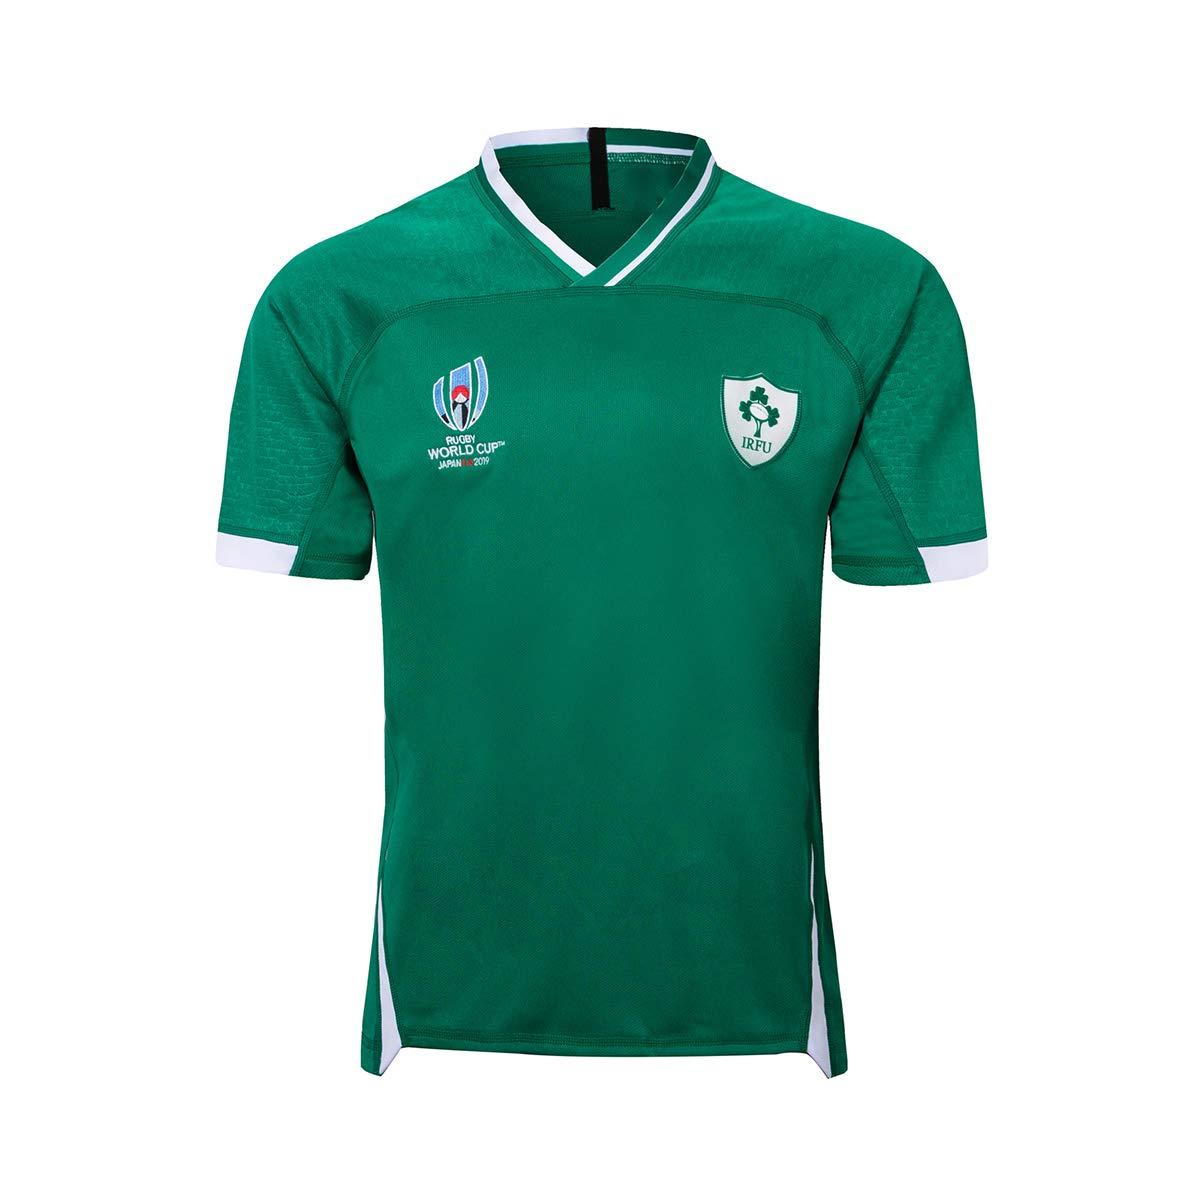 Qinsir T-Shirt Uomo Abbigliamento Rugby,Irlanda Supporters Jersey,Mondiali di Calcio Generico T-Shirt Tifosi Ultras Calcio Sport T-Shirt da Rugby da Uomo T-Shirt da Allenamento